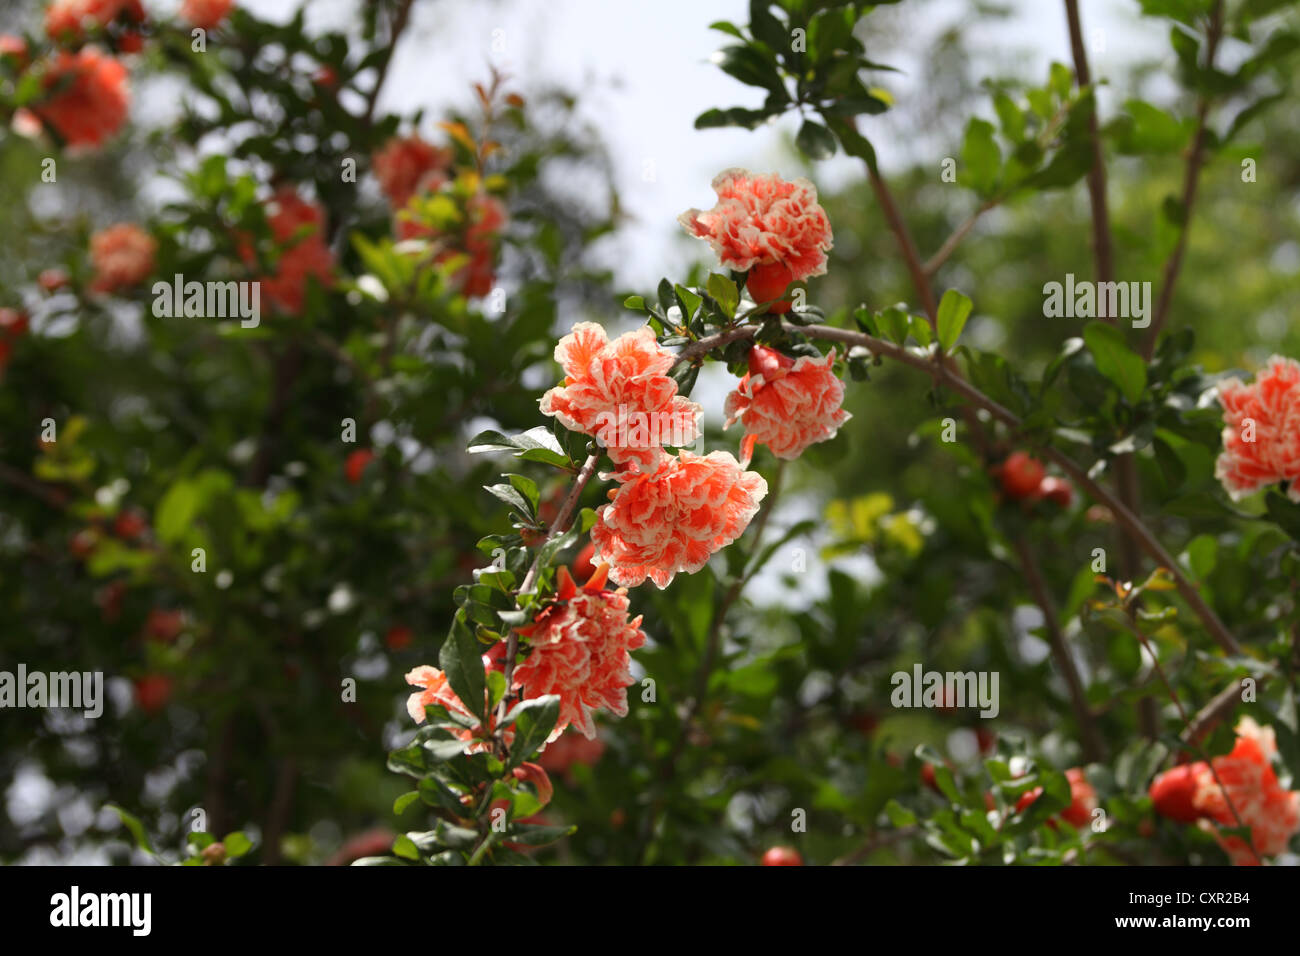 Rare Double White And Orange Pomegranate Flowers Growing Halfeti